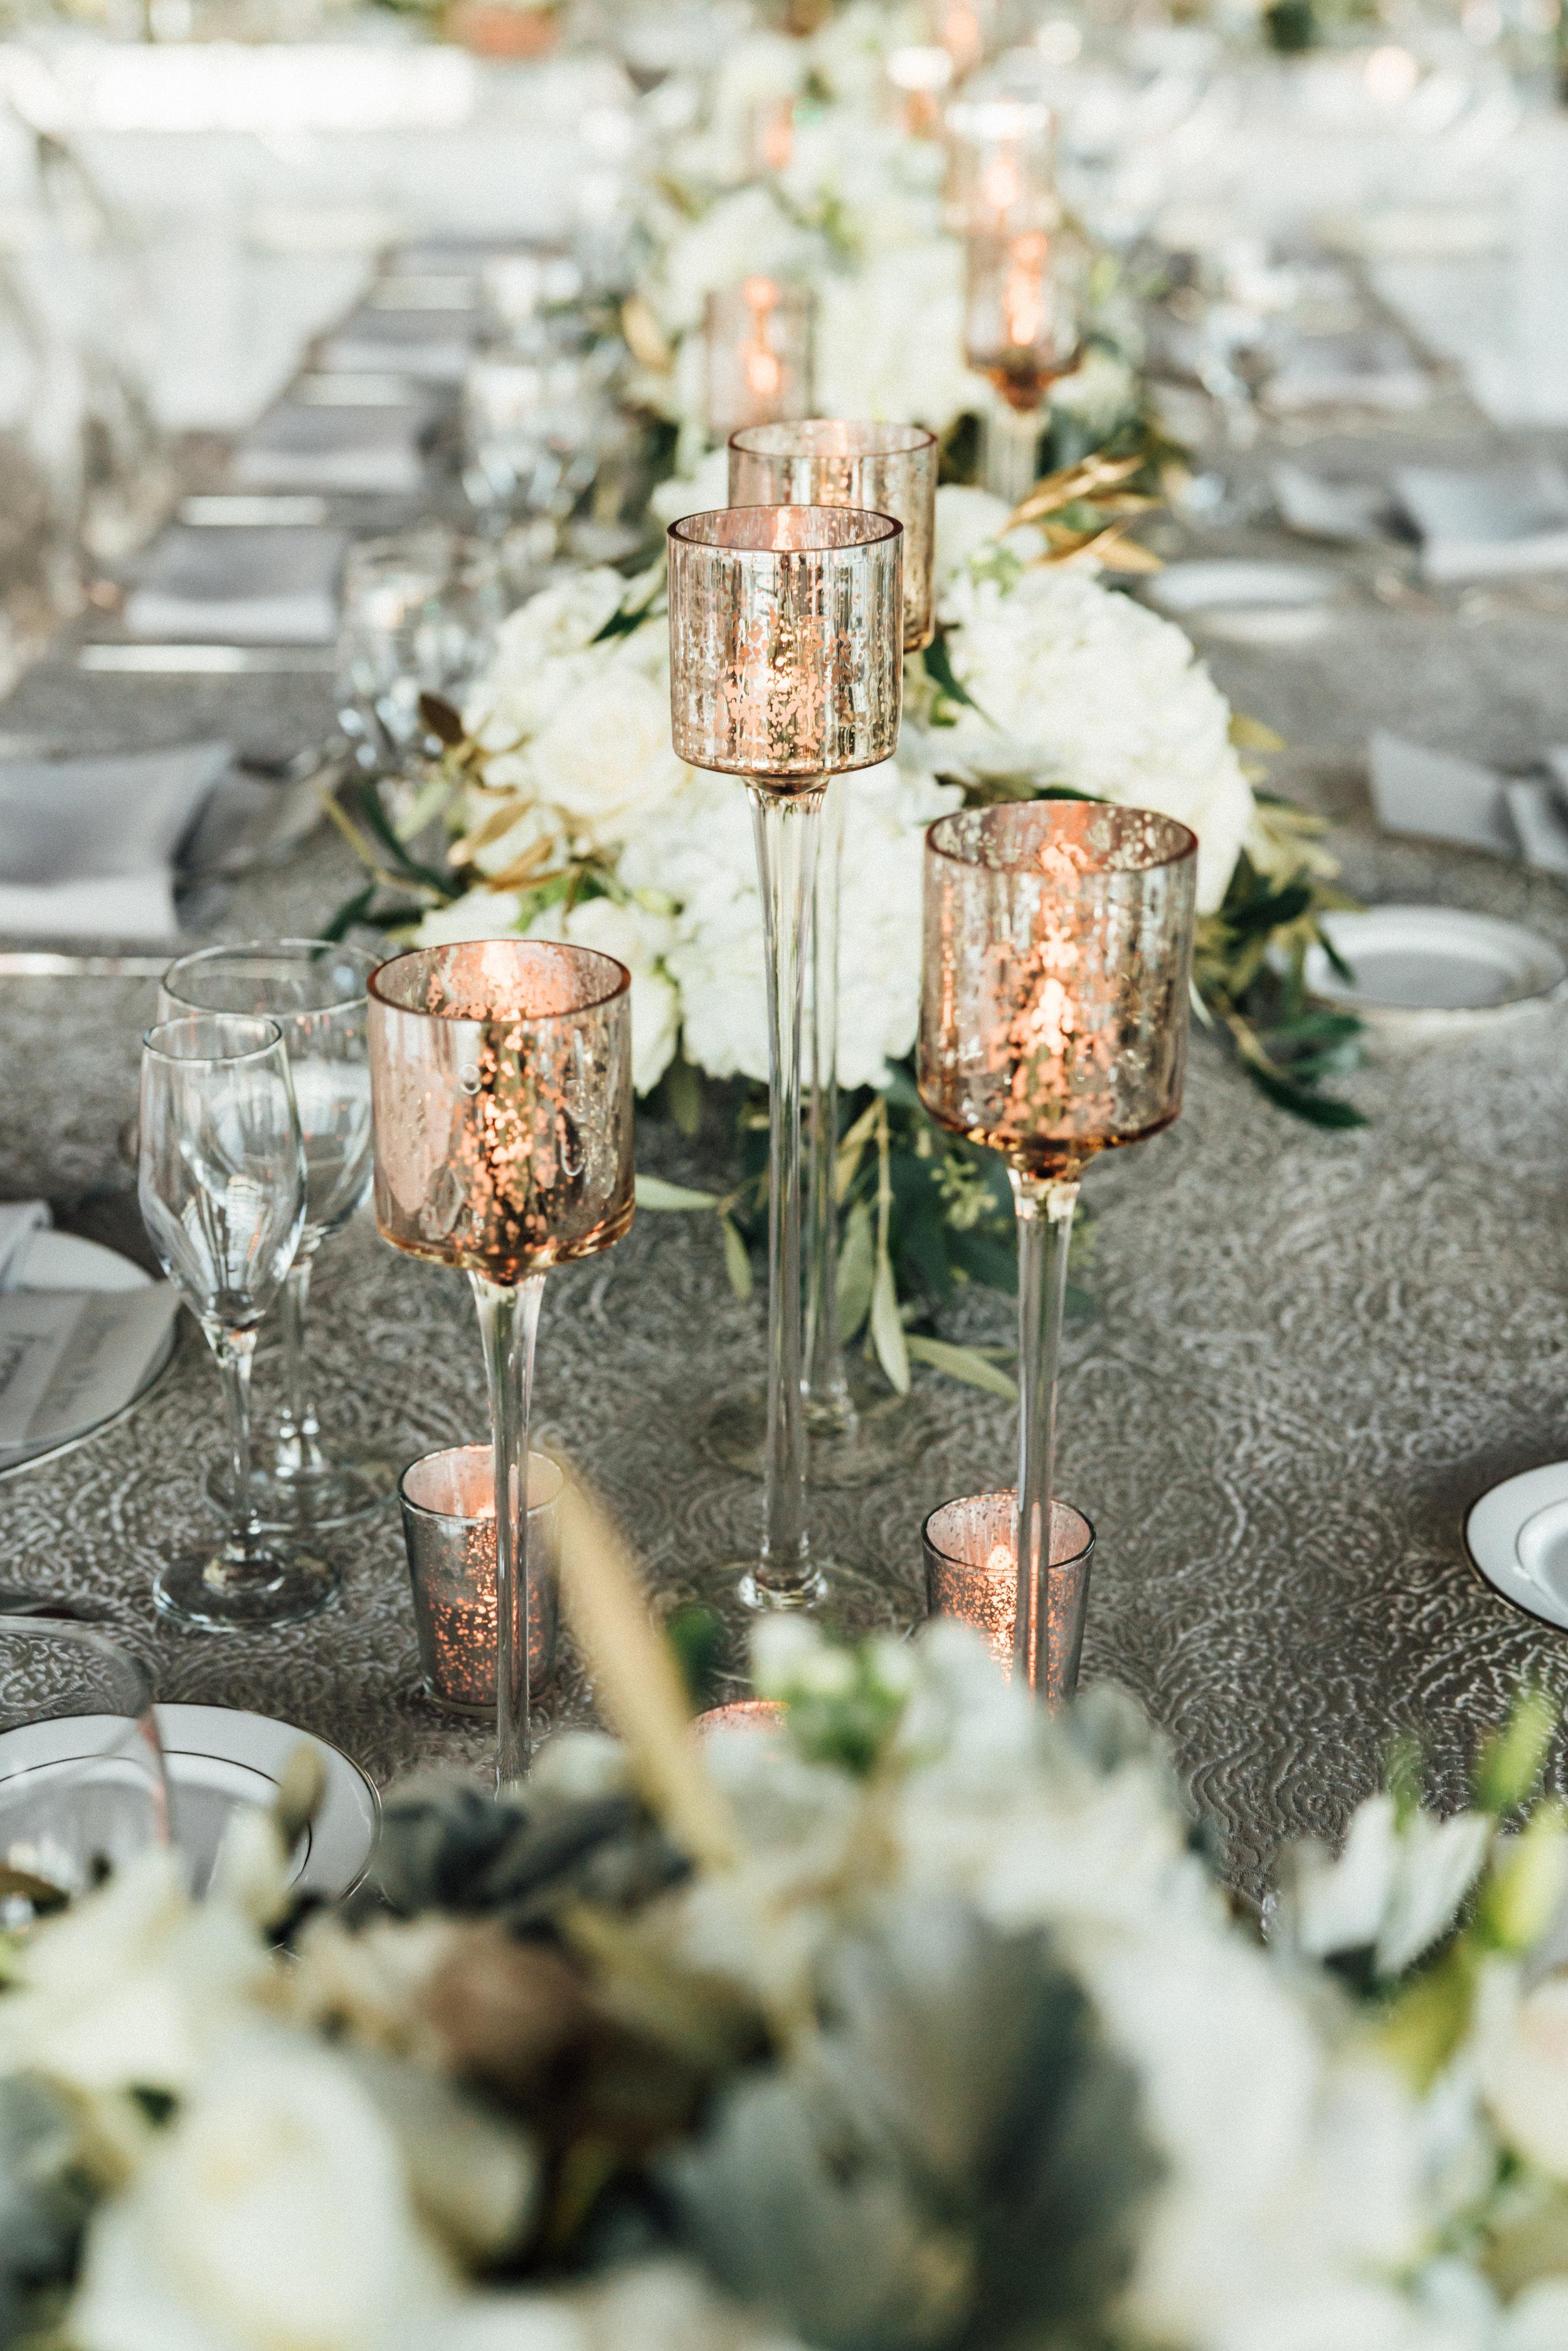 878 Anna _ Danny Wedding DSC08014.jpg